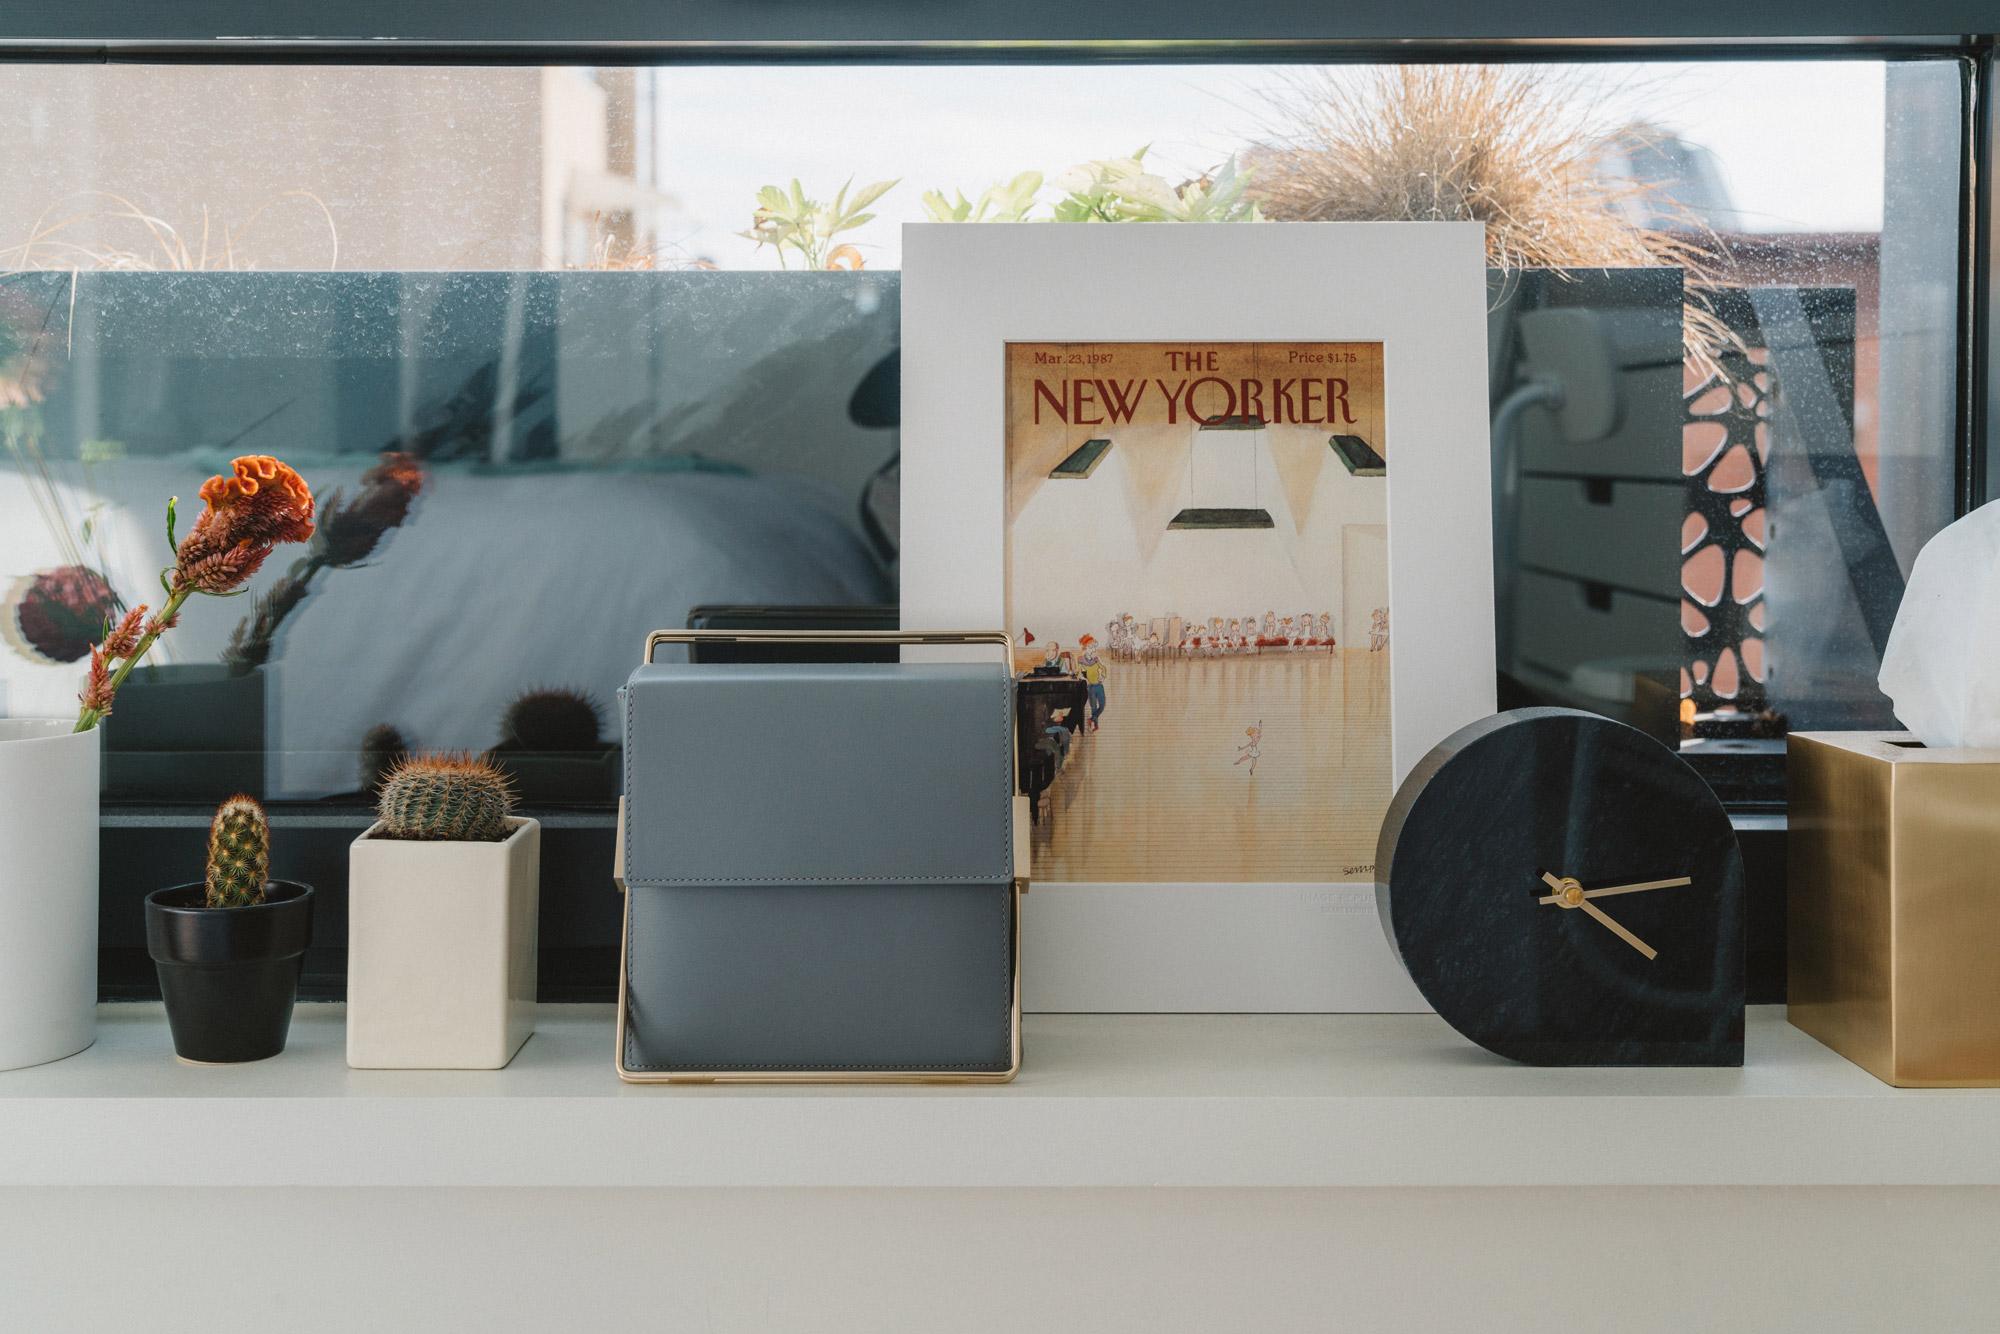 Lautem Bag ,  AYTM Clock ,  Tenfold Tissue Box